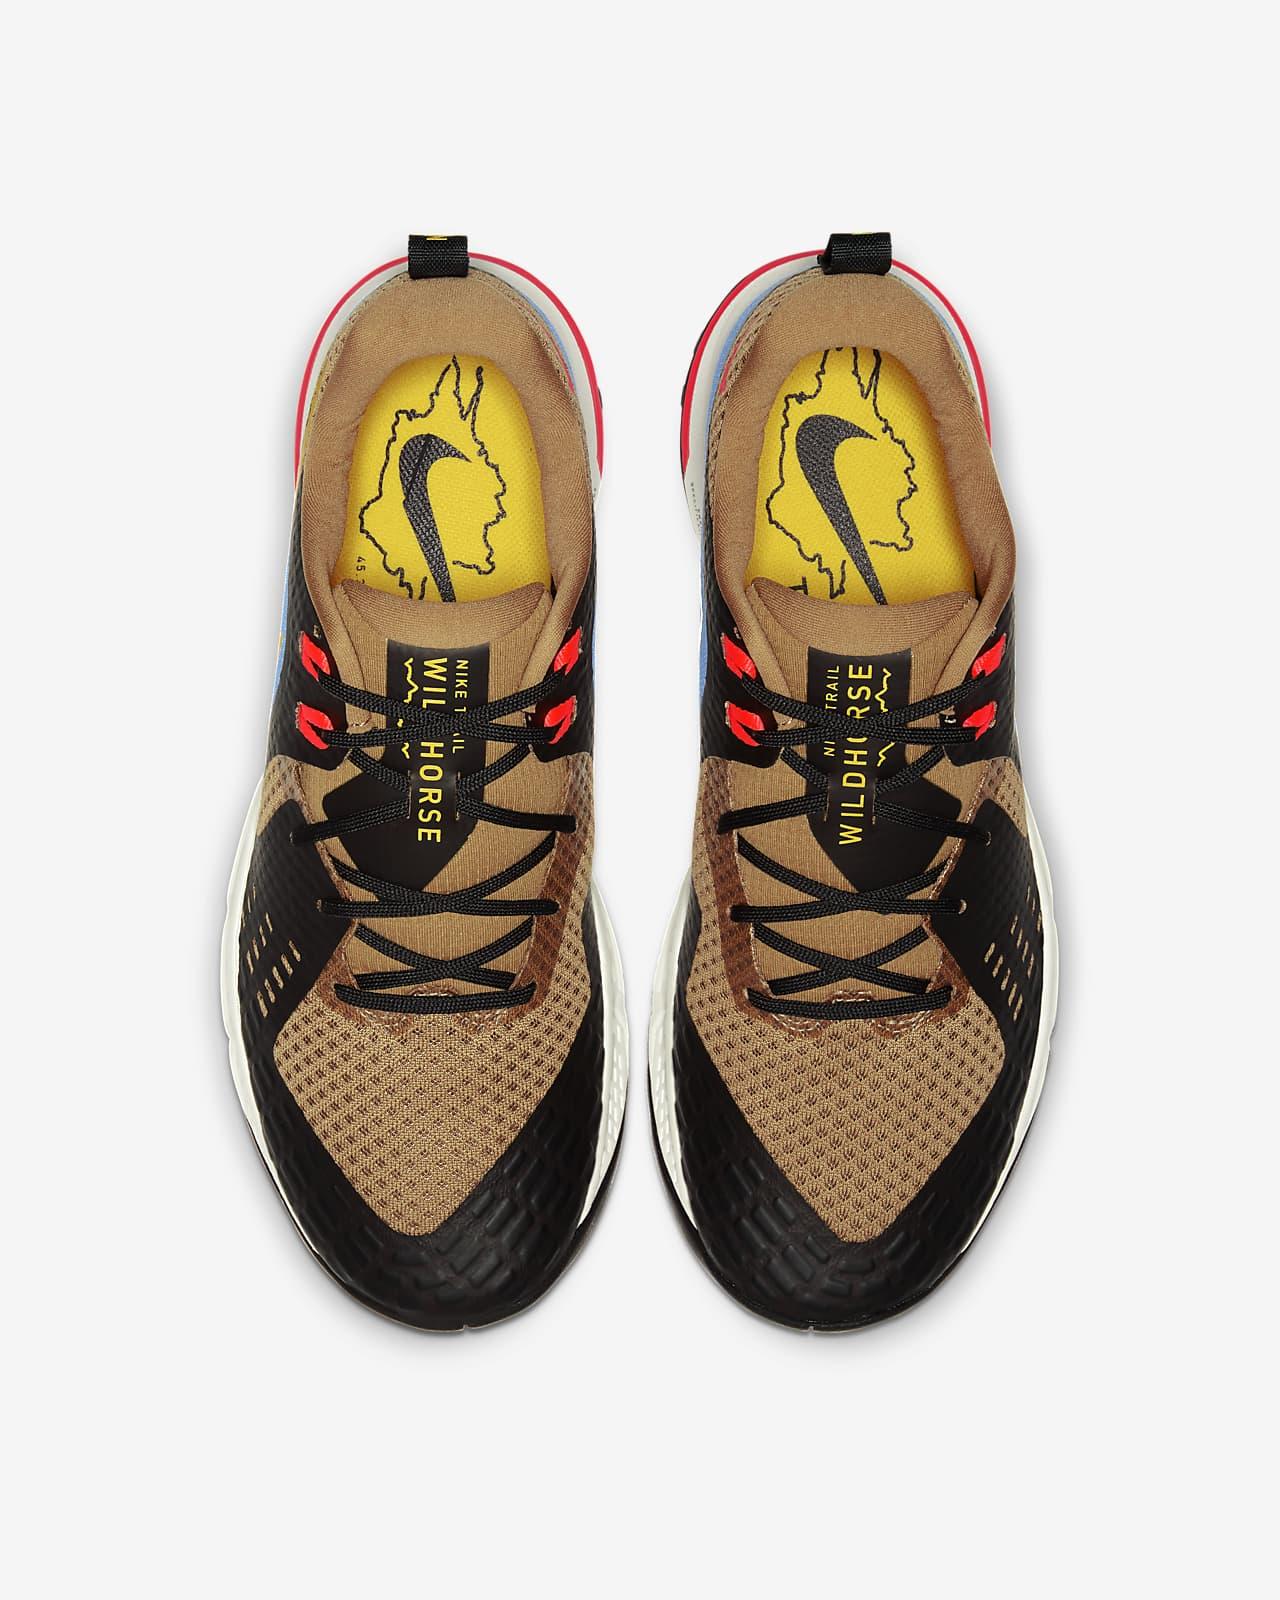 Nike Air Zoom Wildhorse 5 Men's Trail